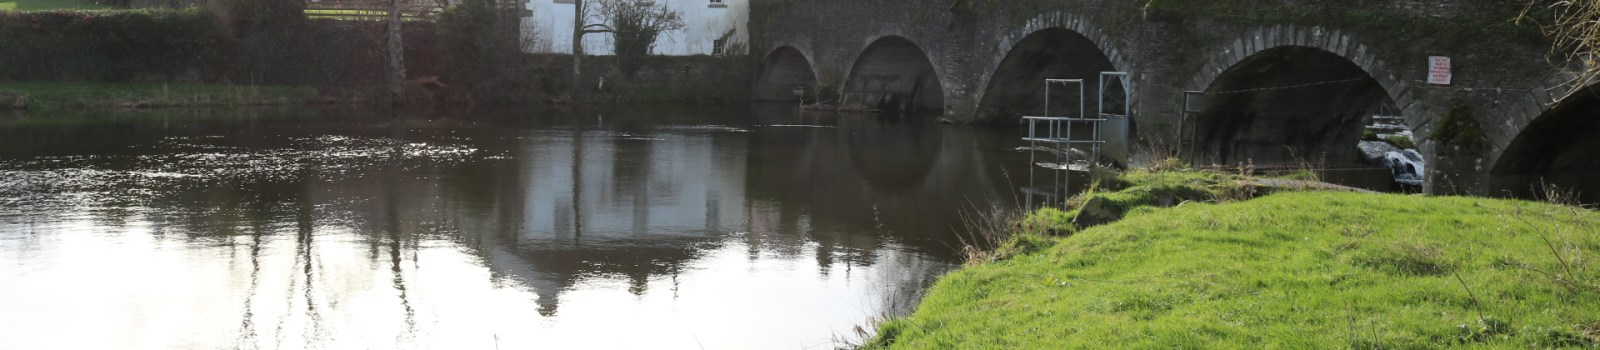 Slaney River, Clohamon